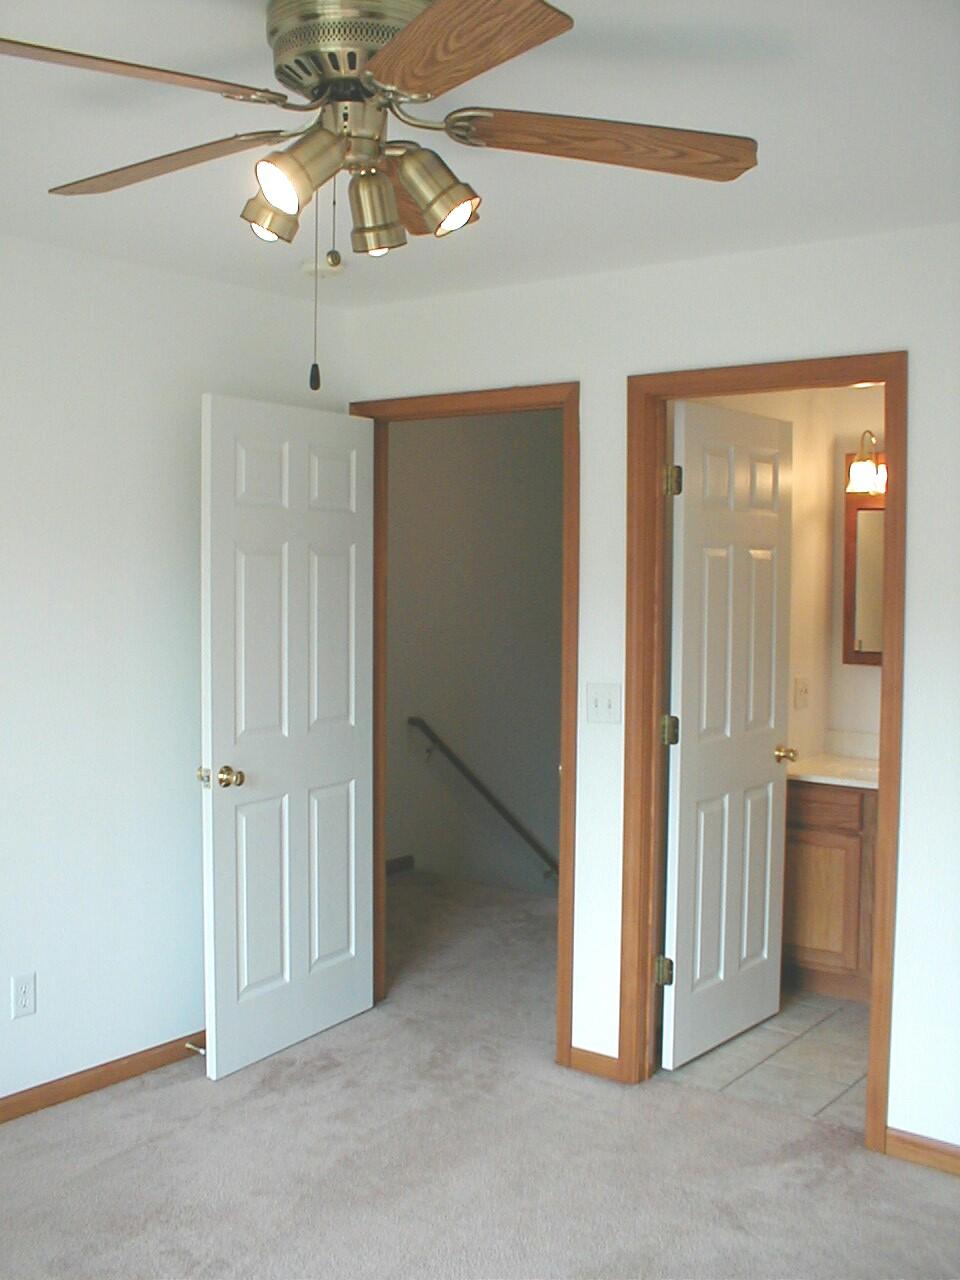 living room 170 x 117 kitchen 142 x 117 12 bathroom 84 x 40 utility room 510 x 40 each bedroom 124 x 121 each full bath - Living Room Rentals